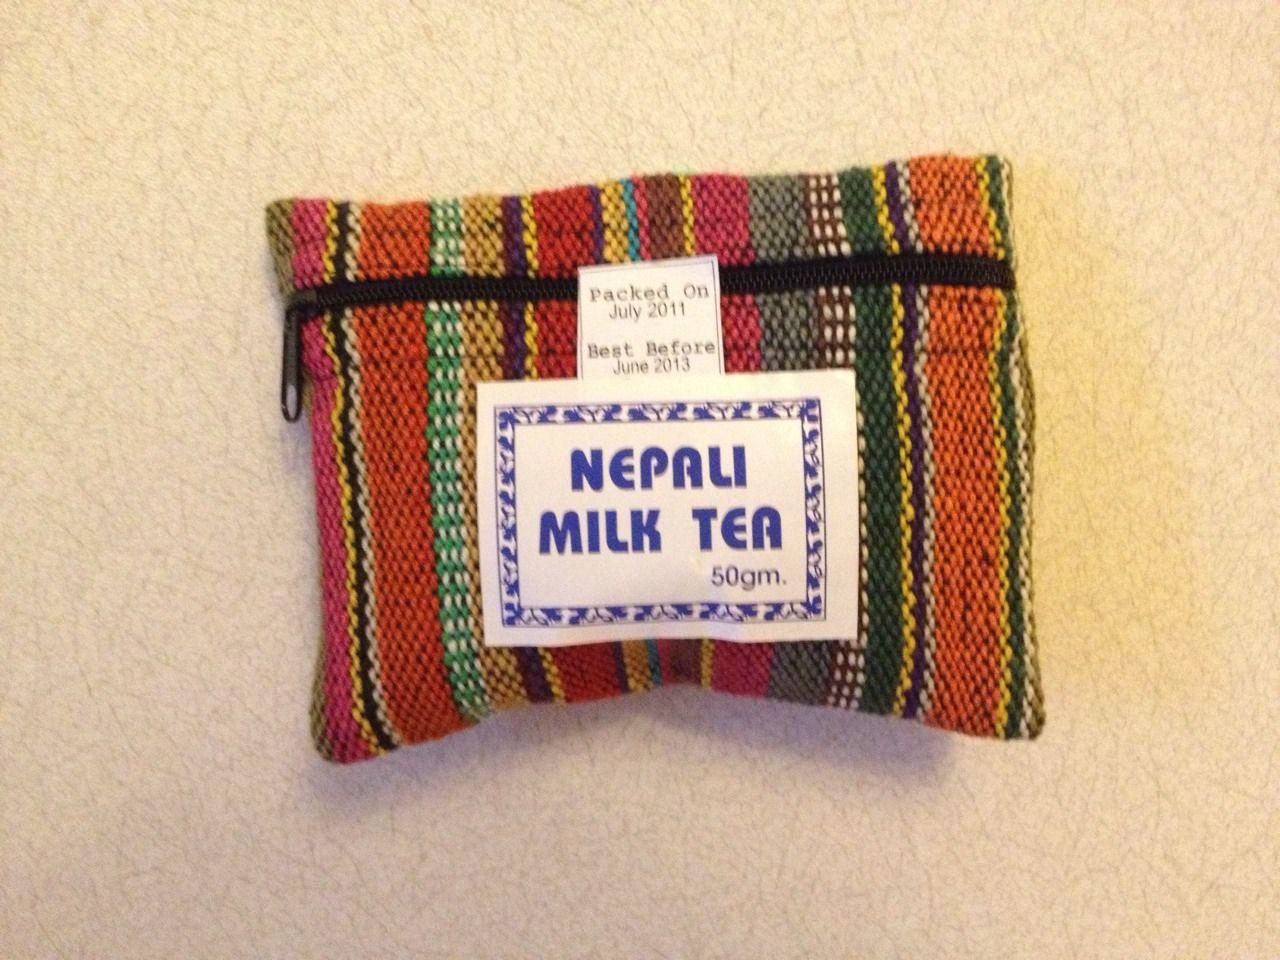 ... milk nutella milk ginger n milk tea 1 swahili ginger n milk tea global